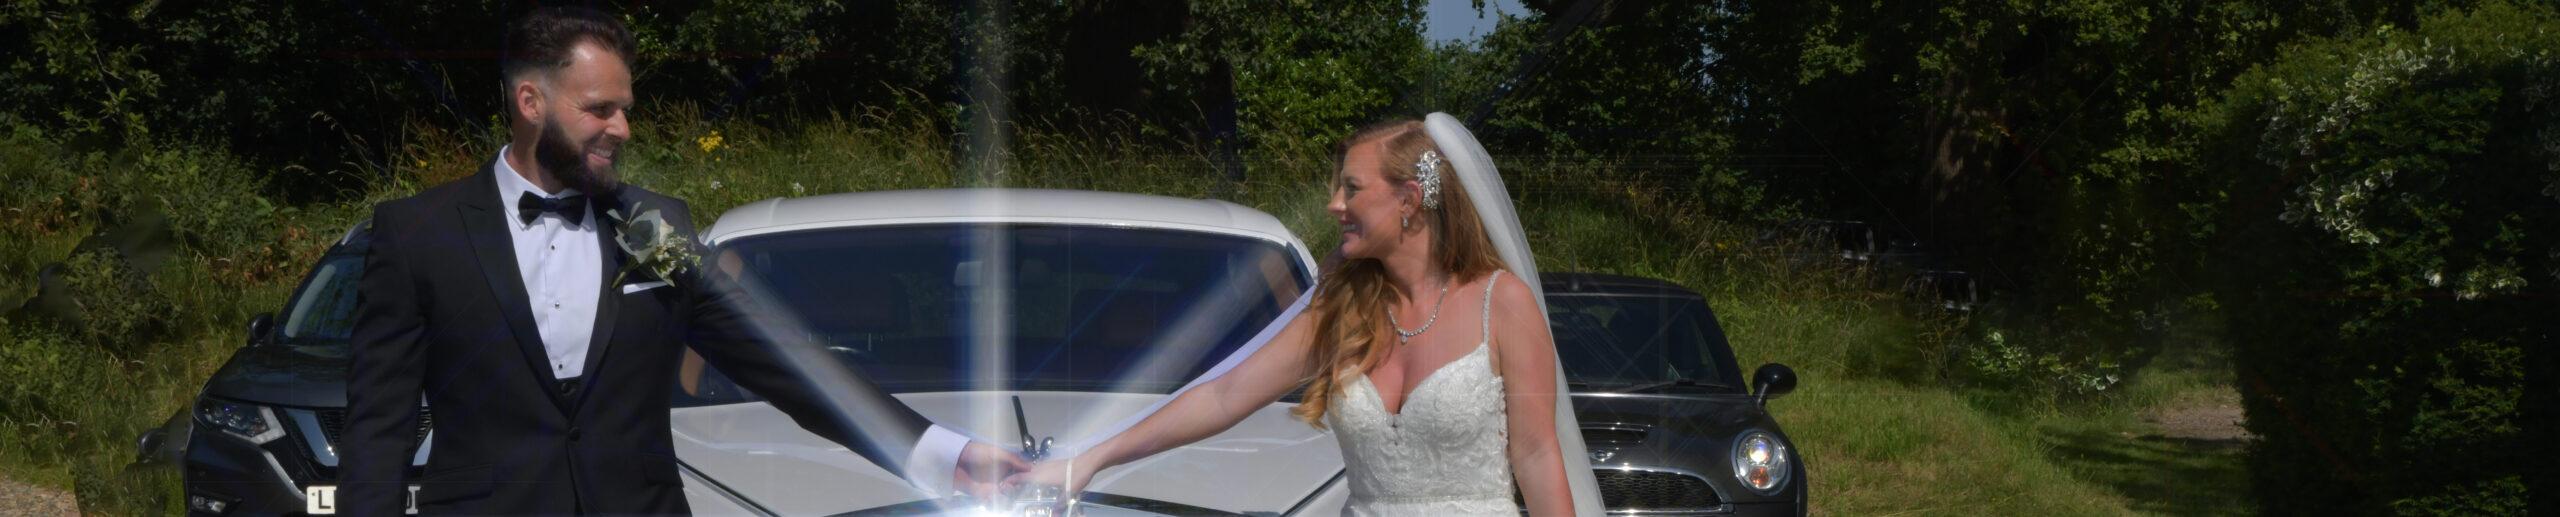 Wedding photographer London Shenley Club